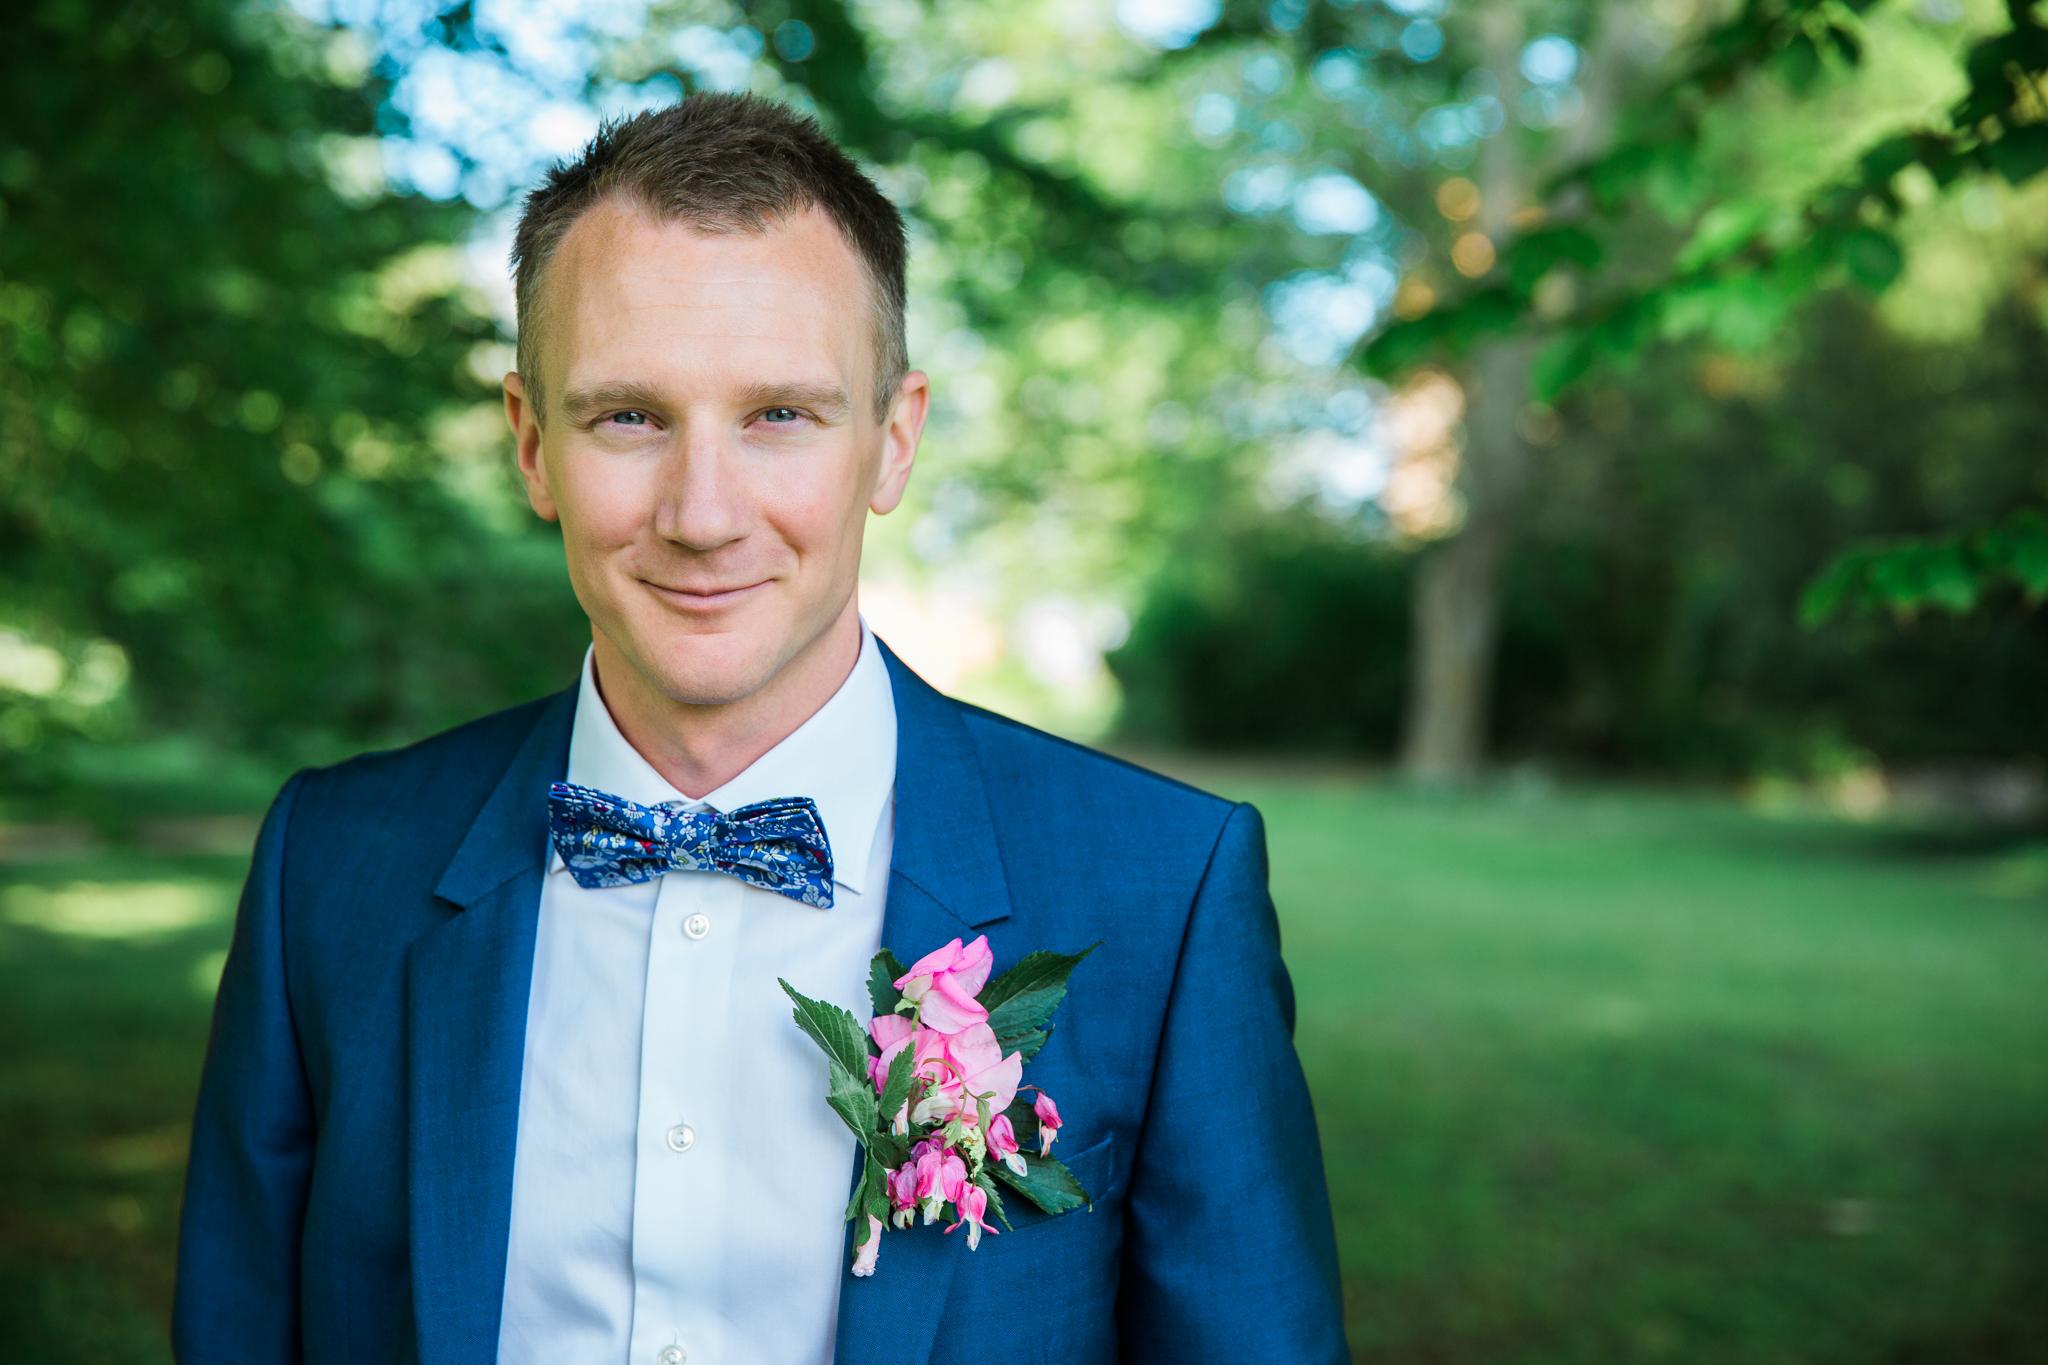 ViOli Photography bröllopsfotograf-Karlshamn-Blekinge-Ronneby-Karlskrona-Sölvesborg-Bromölla-Kristianstad (32 av 35)